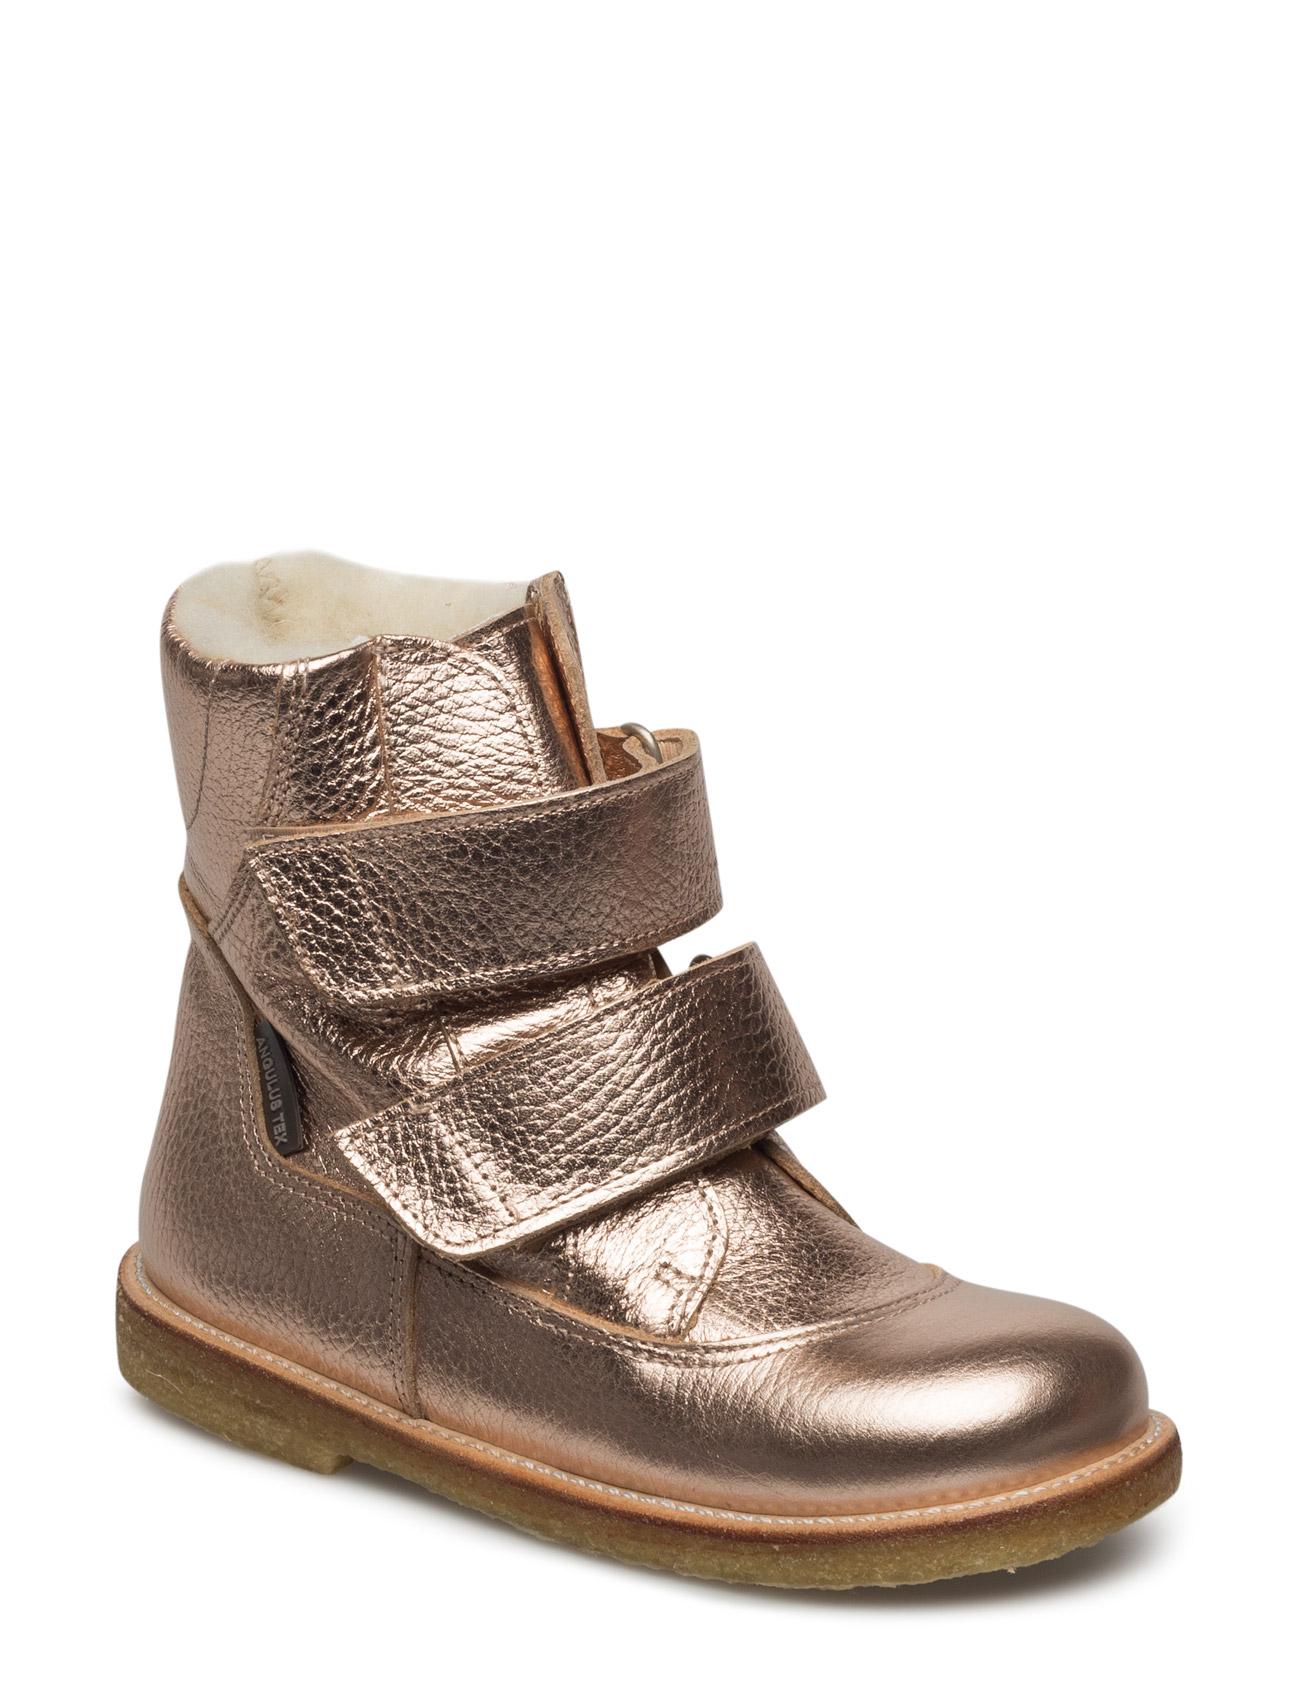 Boots - Flat - With Velcro ANGULUS Stövlar